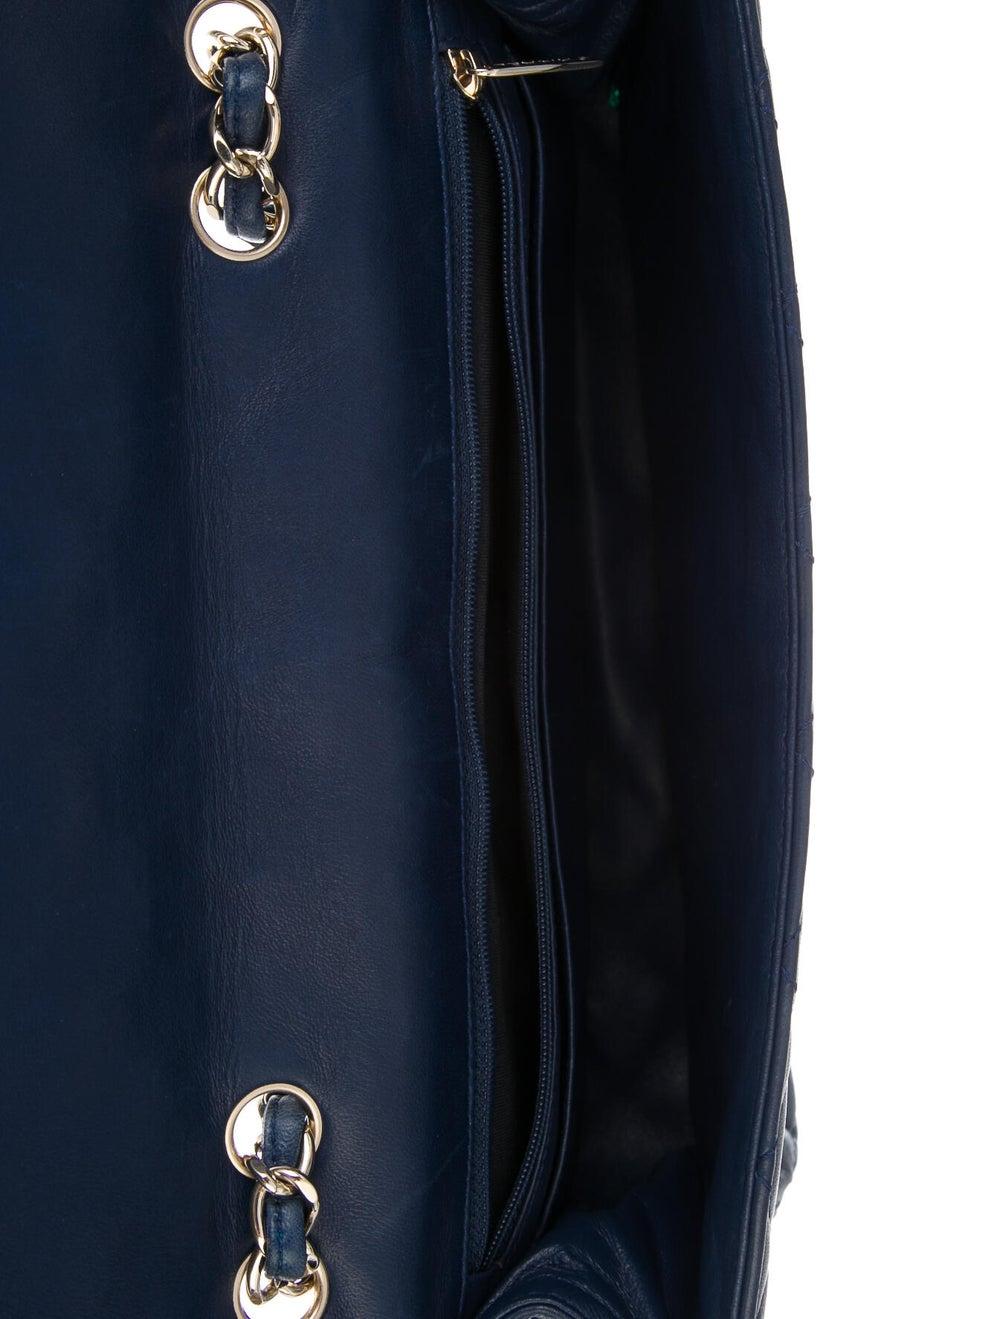 Chanel Classic Jumbo Single Flap Bag Blue - image 5